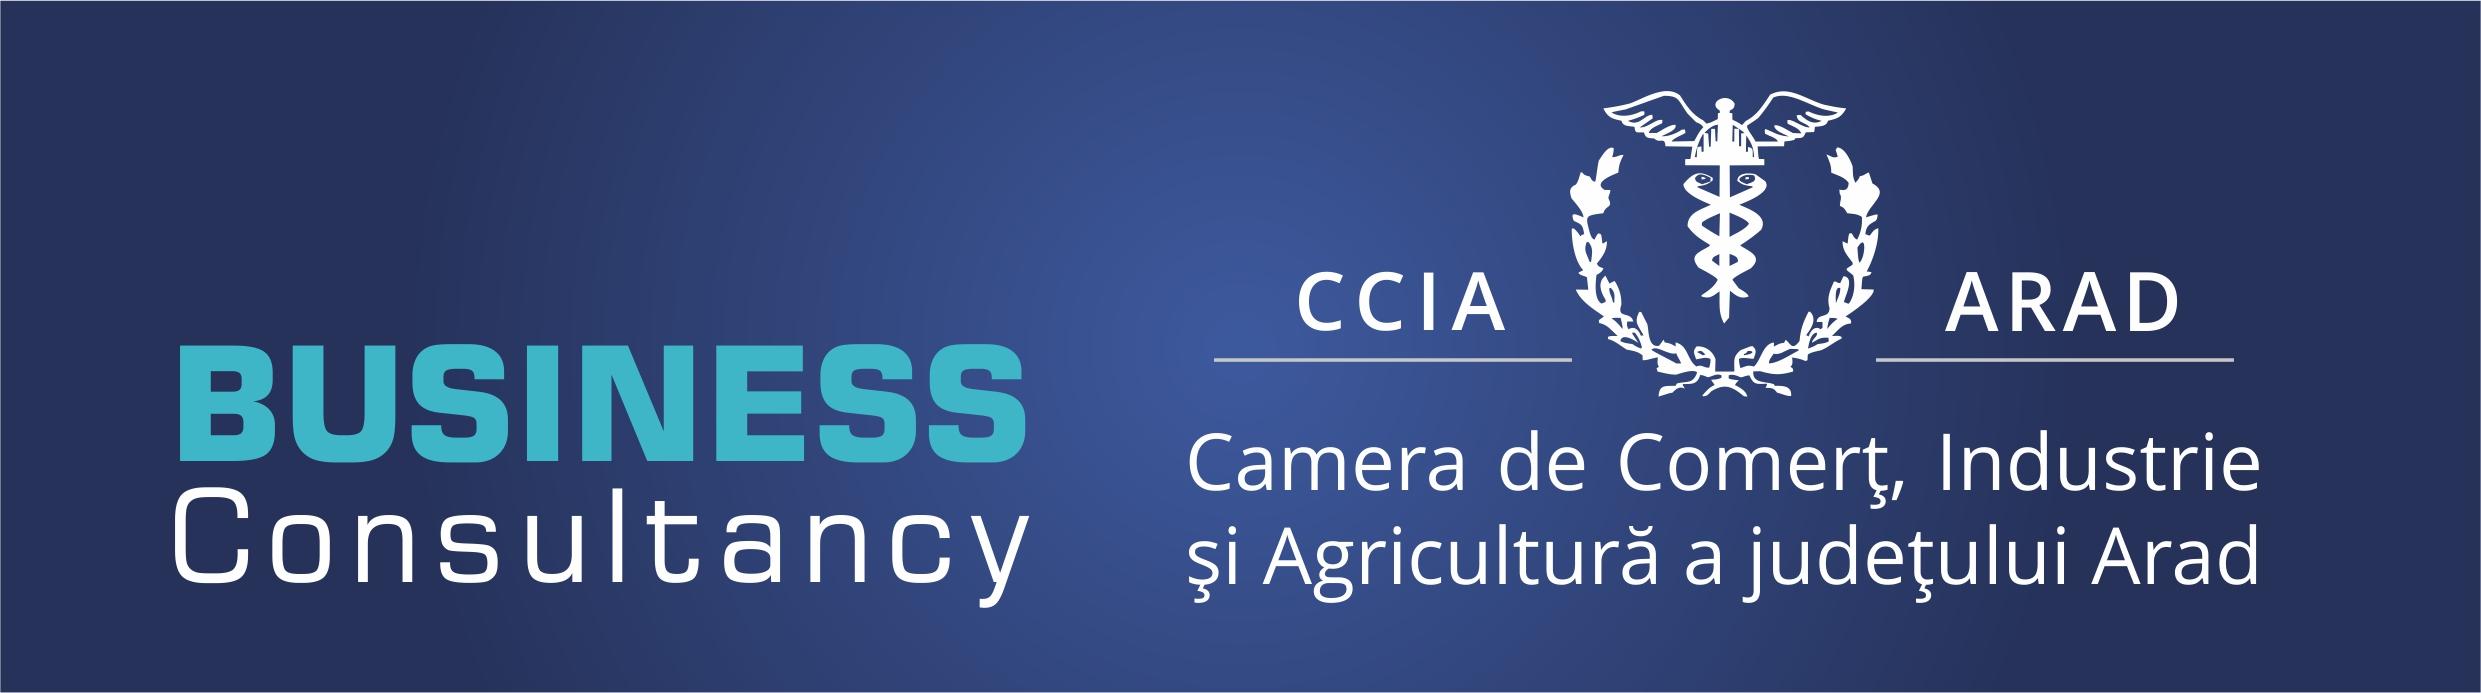 CCIA Business Consultancy